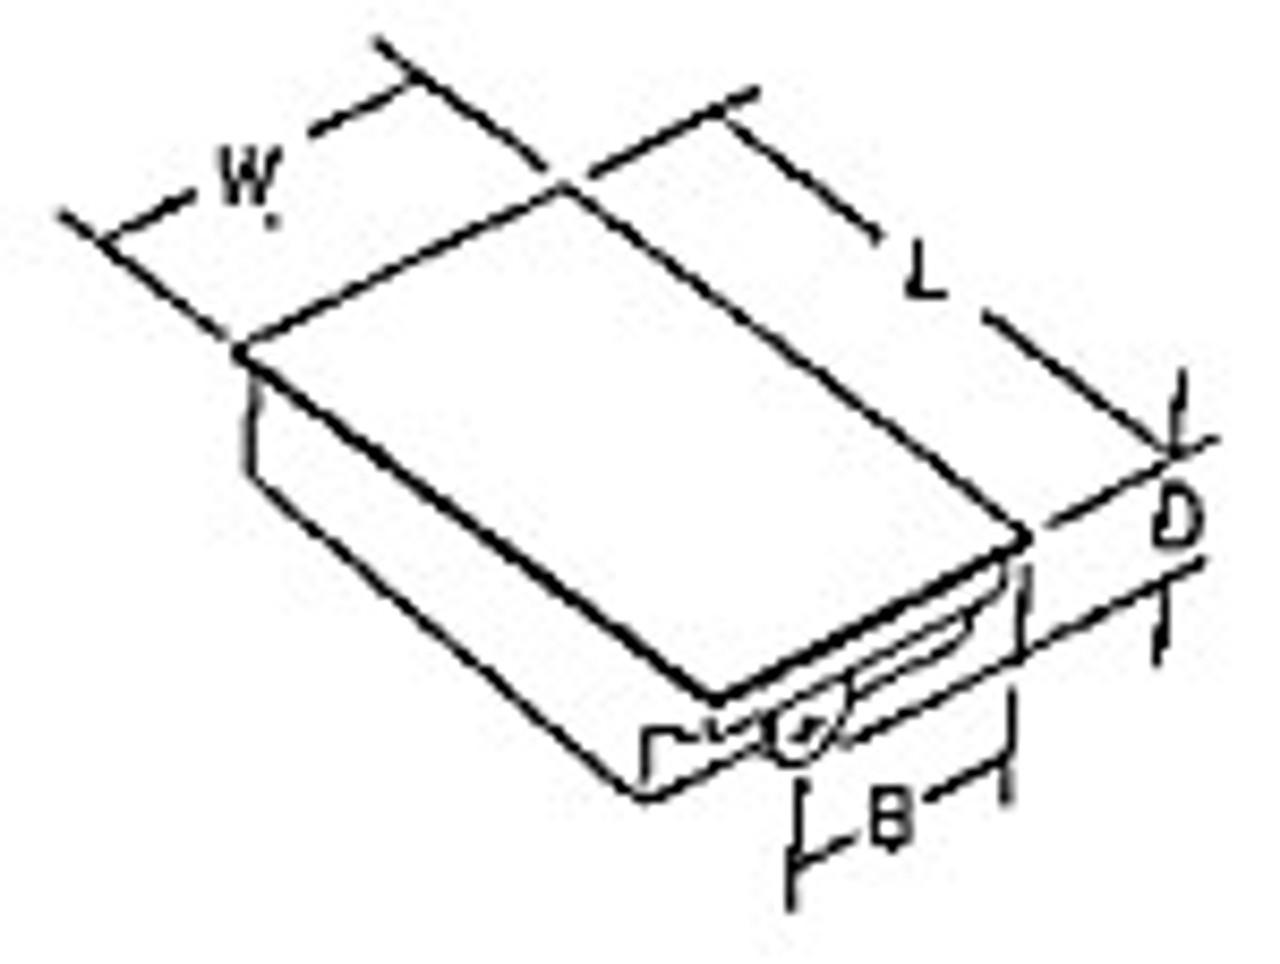 ABS HOLDING TANK END DRAIN - 15 GALLON (11-1063)